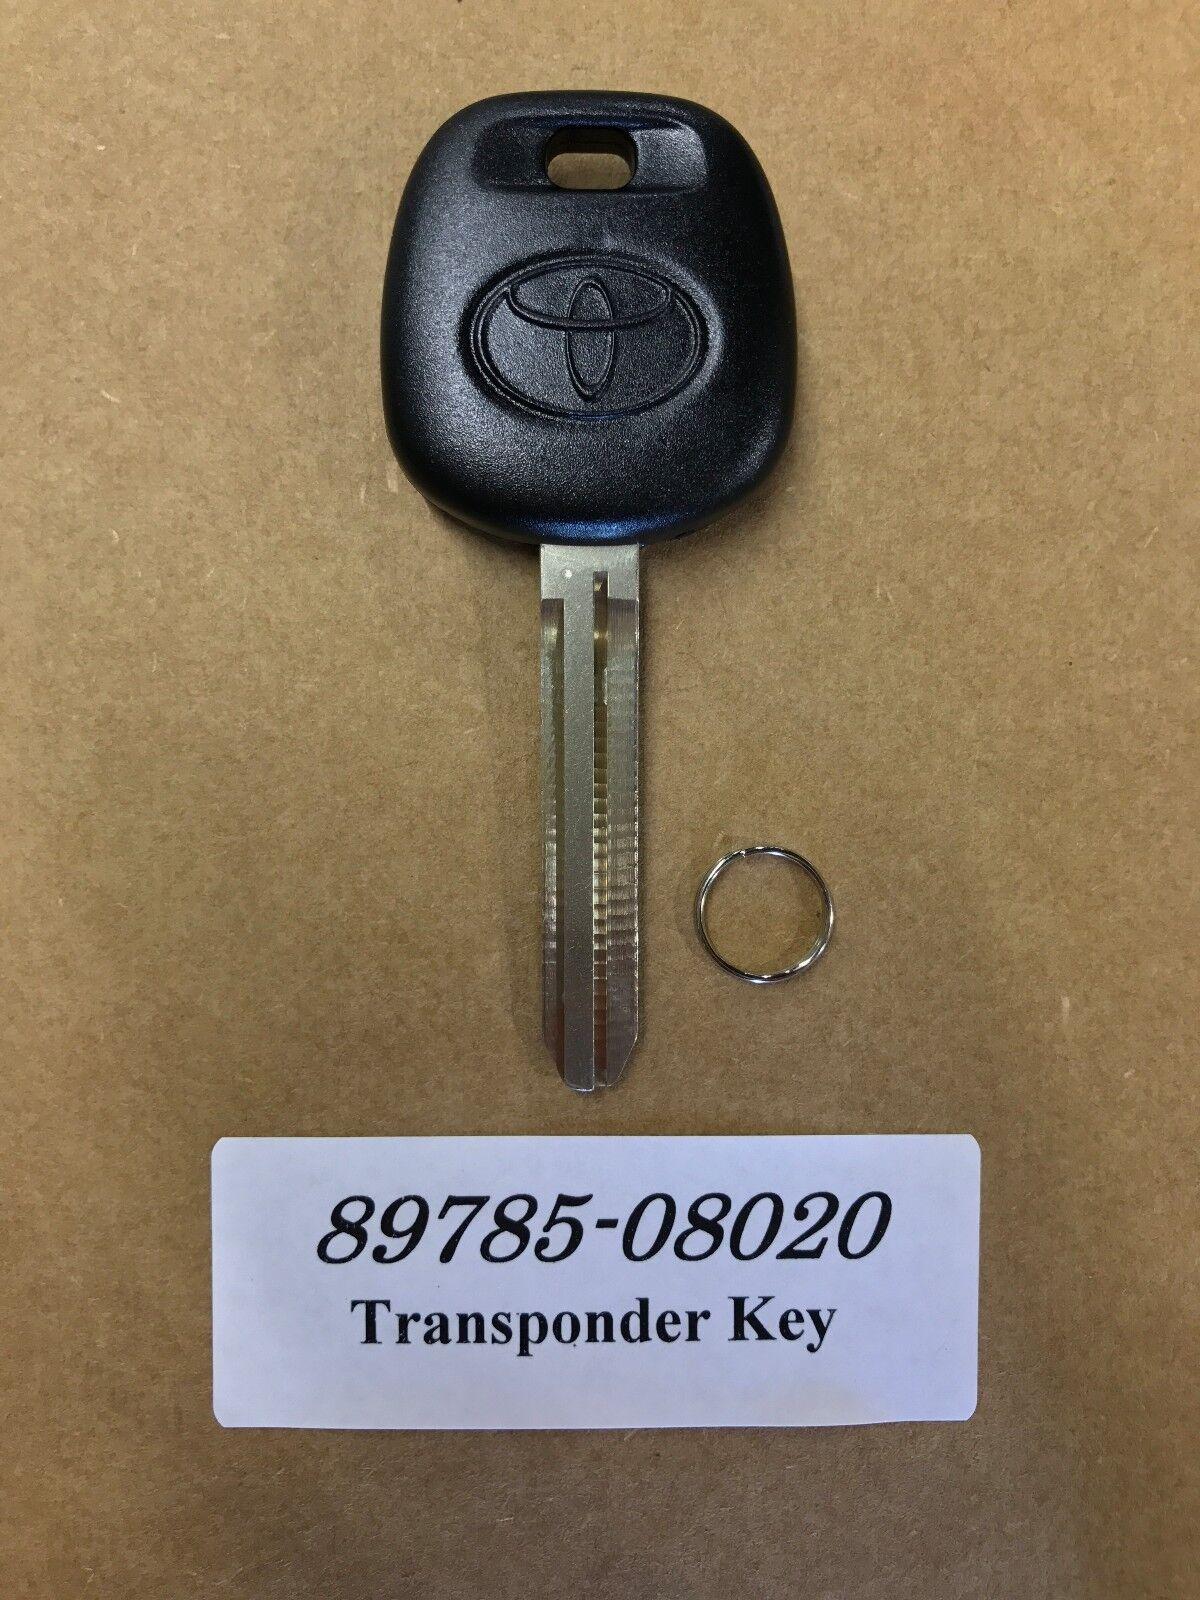 Oem Rubber Toyota Transponder Chip Dot Key 4d 89785 08020 Ebay 20072008 Infiniti G35 Smart Keyless Entry Remote Dealer Program Norton Secured Powered By Verisign